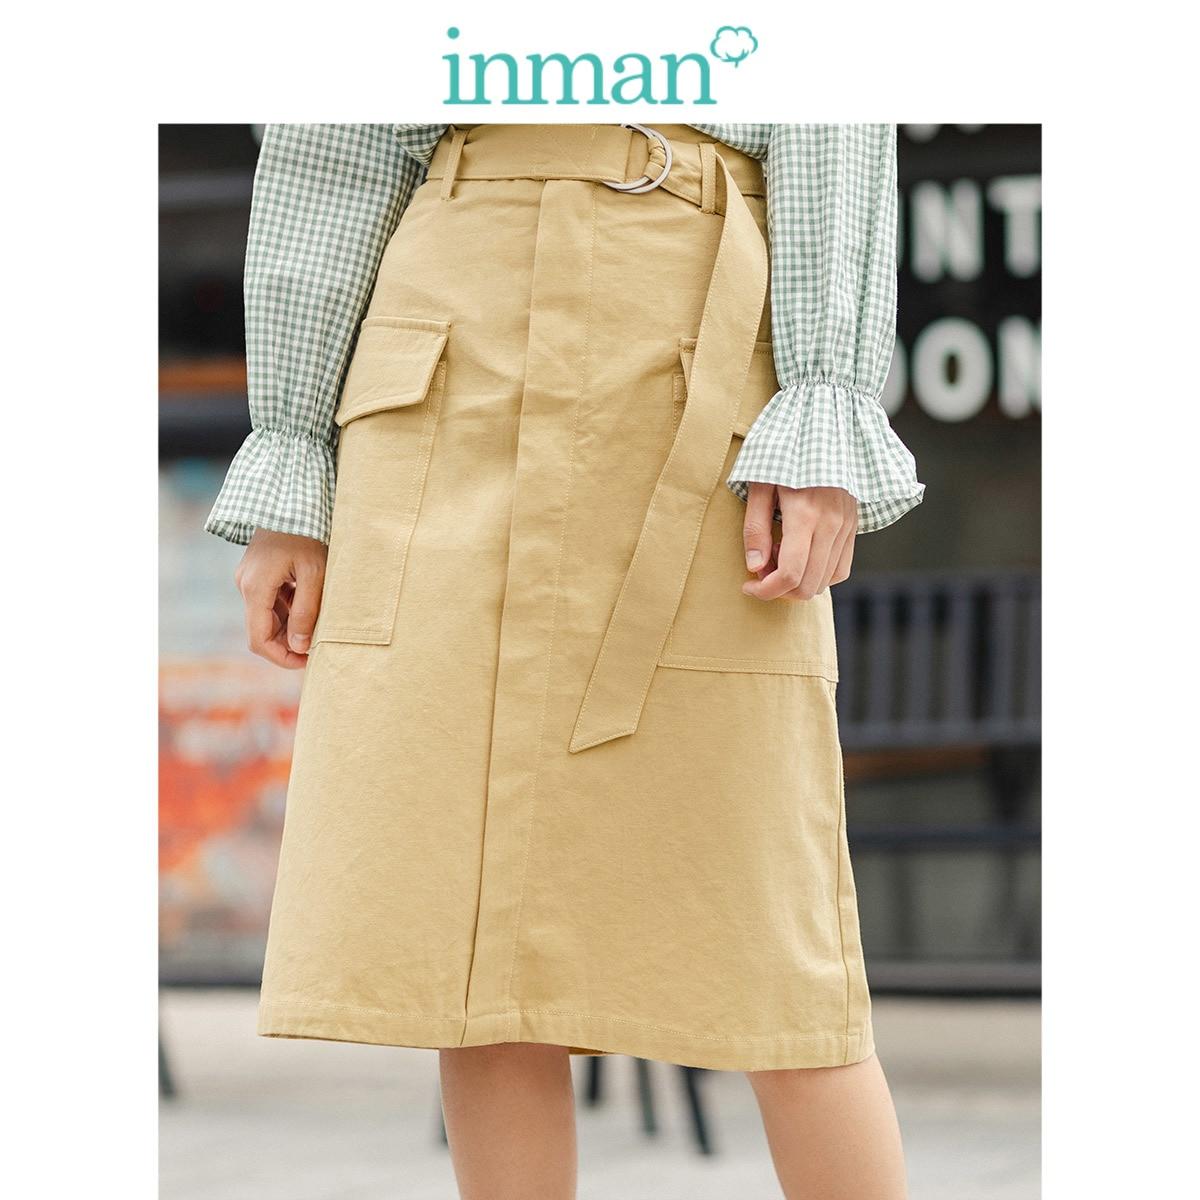 INMAN 2020 Spring New Arrival Solid Color Waist Belt Big Pocket A Line Fitting Lady Knee Length Skirt